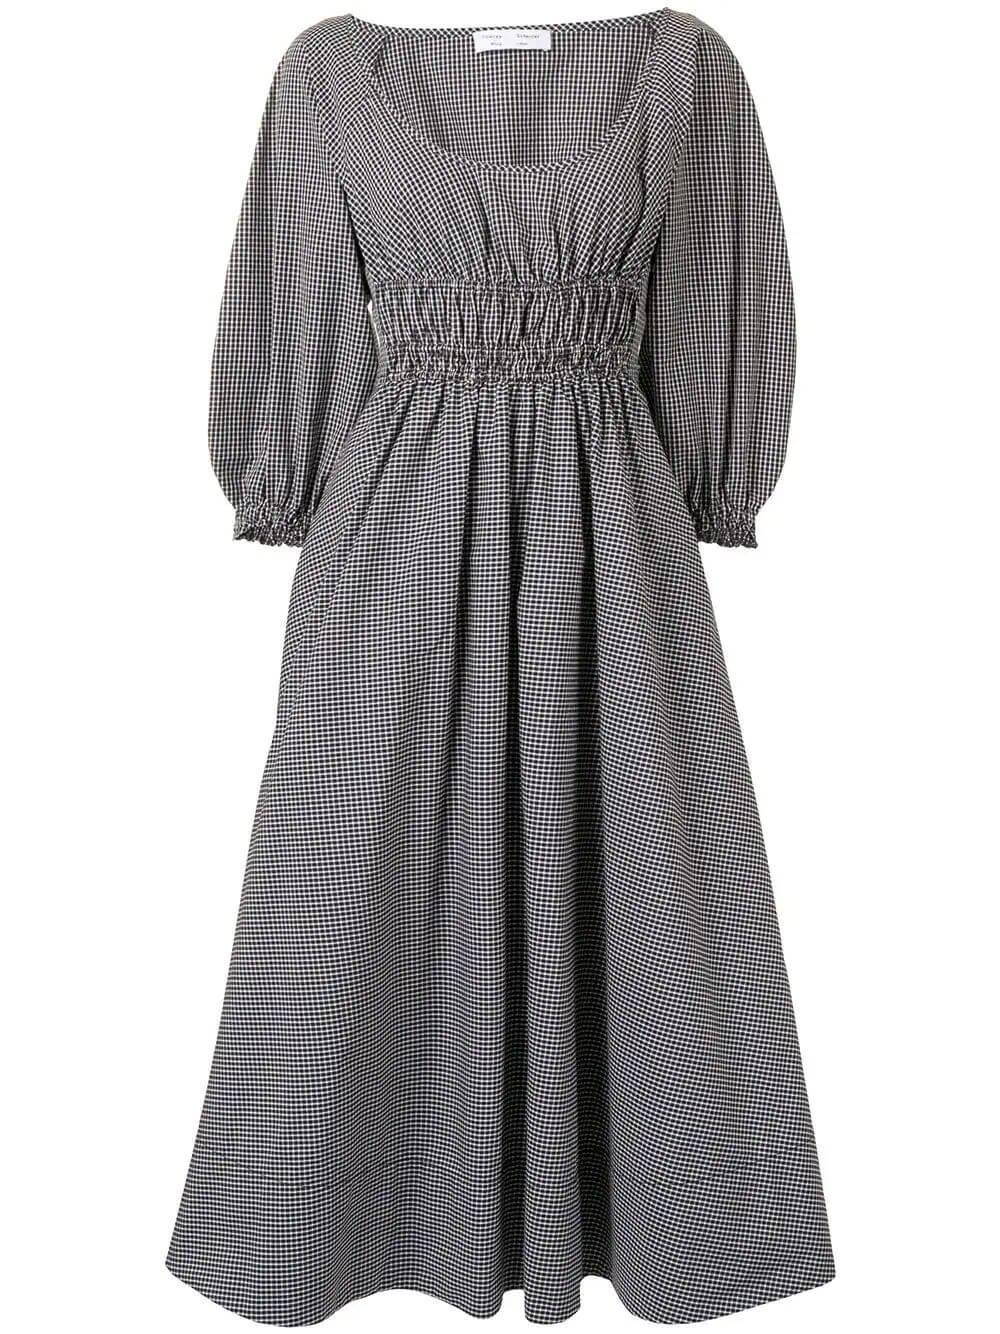 Full Sleeve Plaid Dress Item # WL2123164